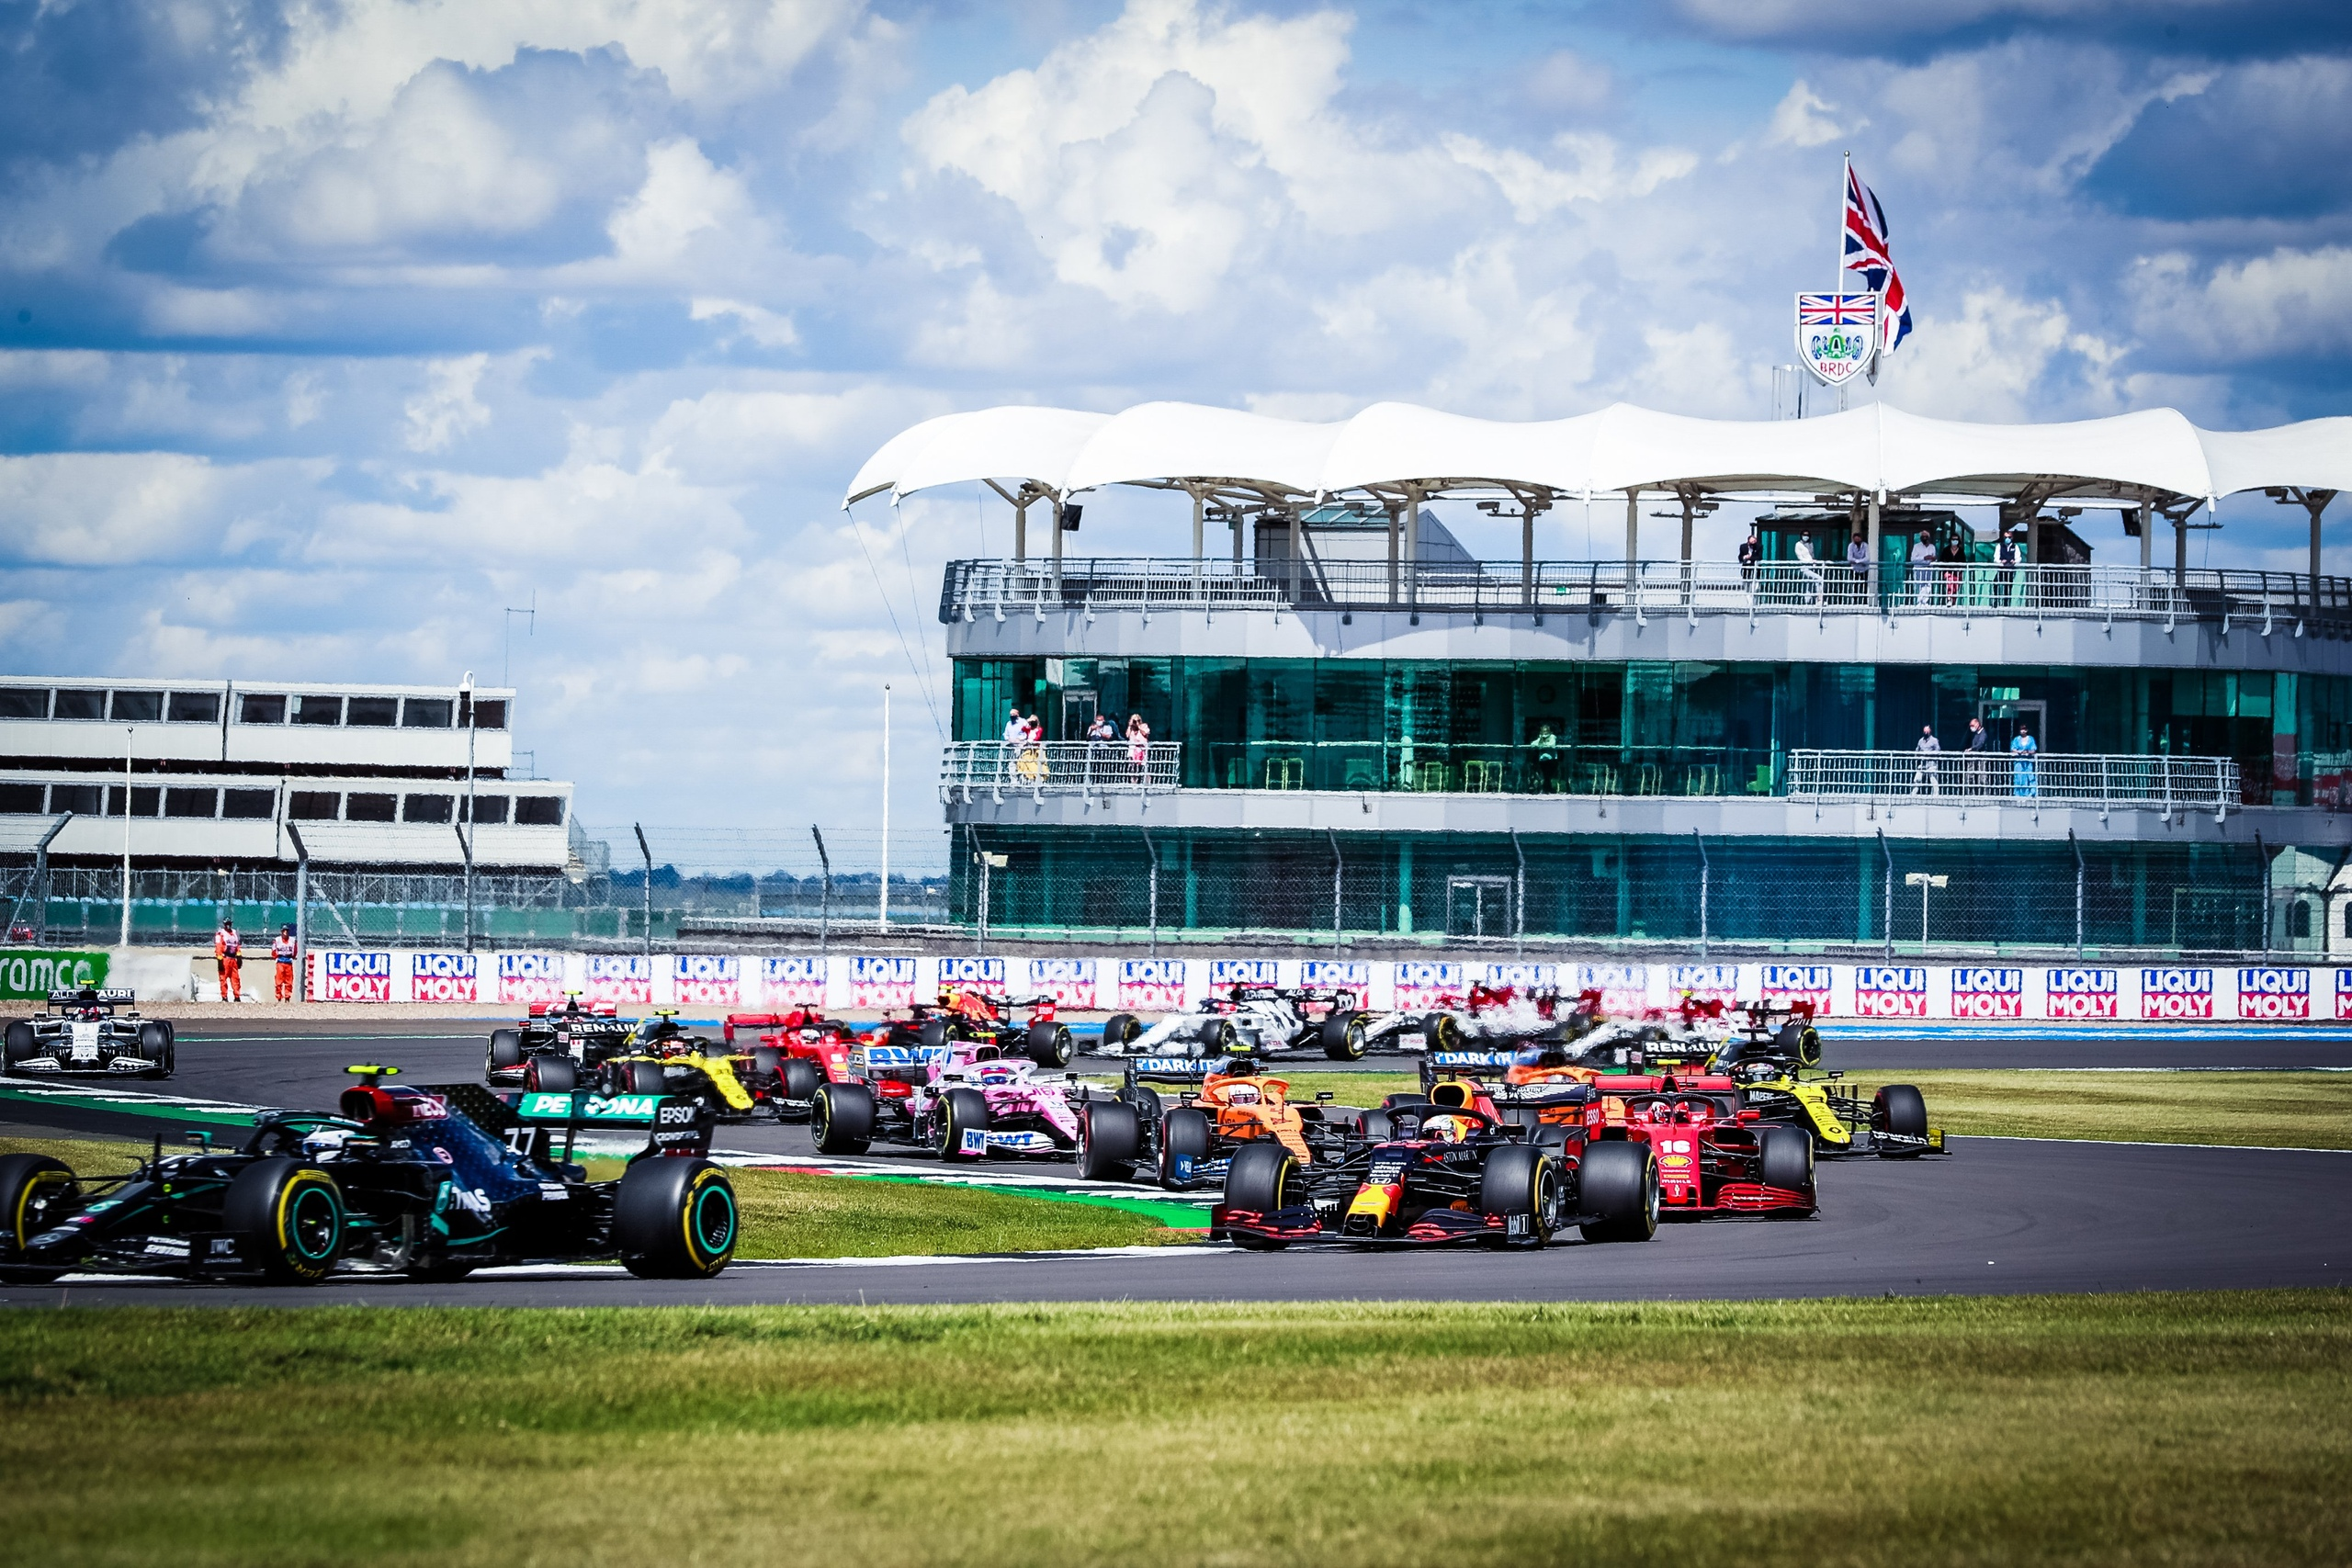 Старт гран-при Формулы-1 на автодроме Сильверстоун